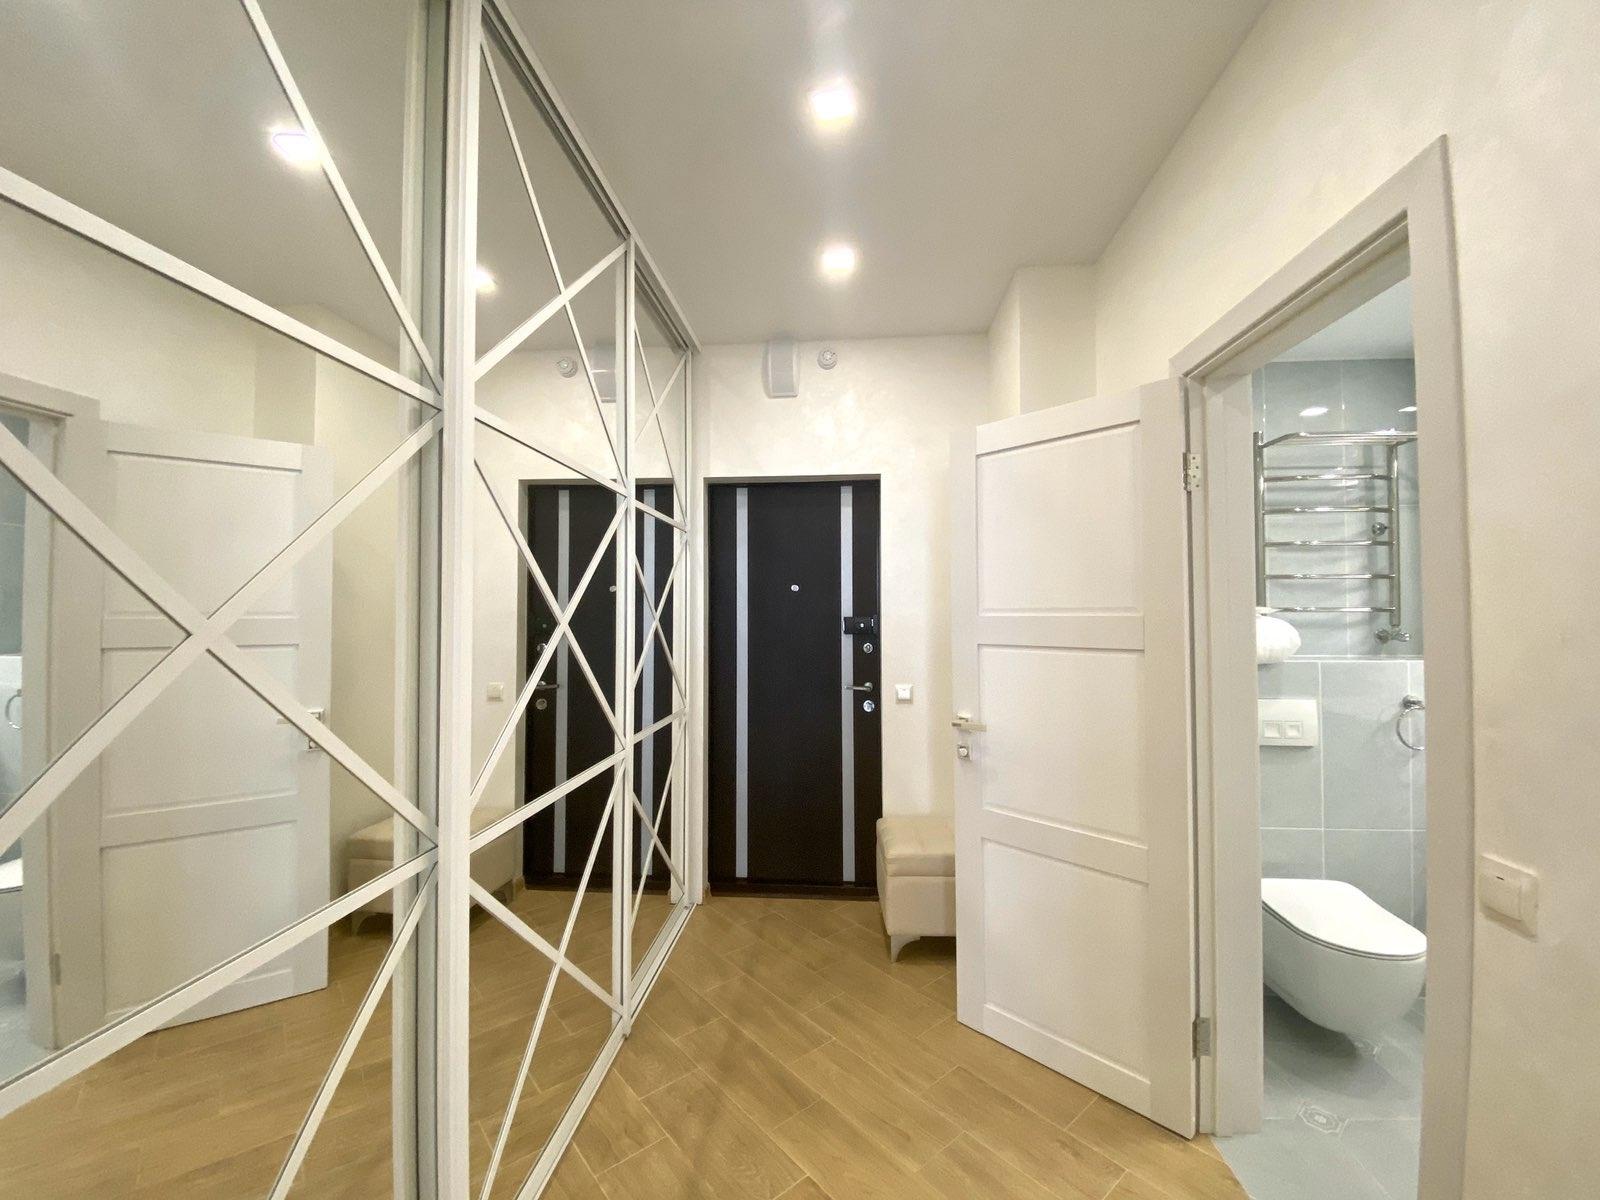 Интерьер квартиры-студии в Севастополе.